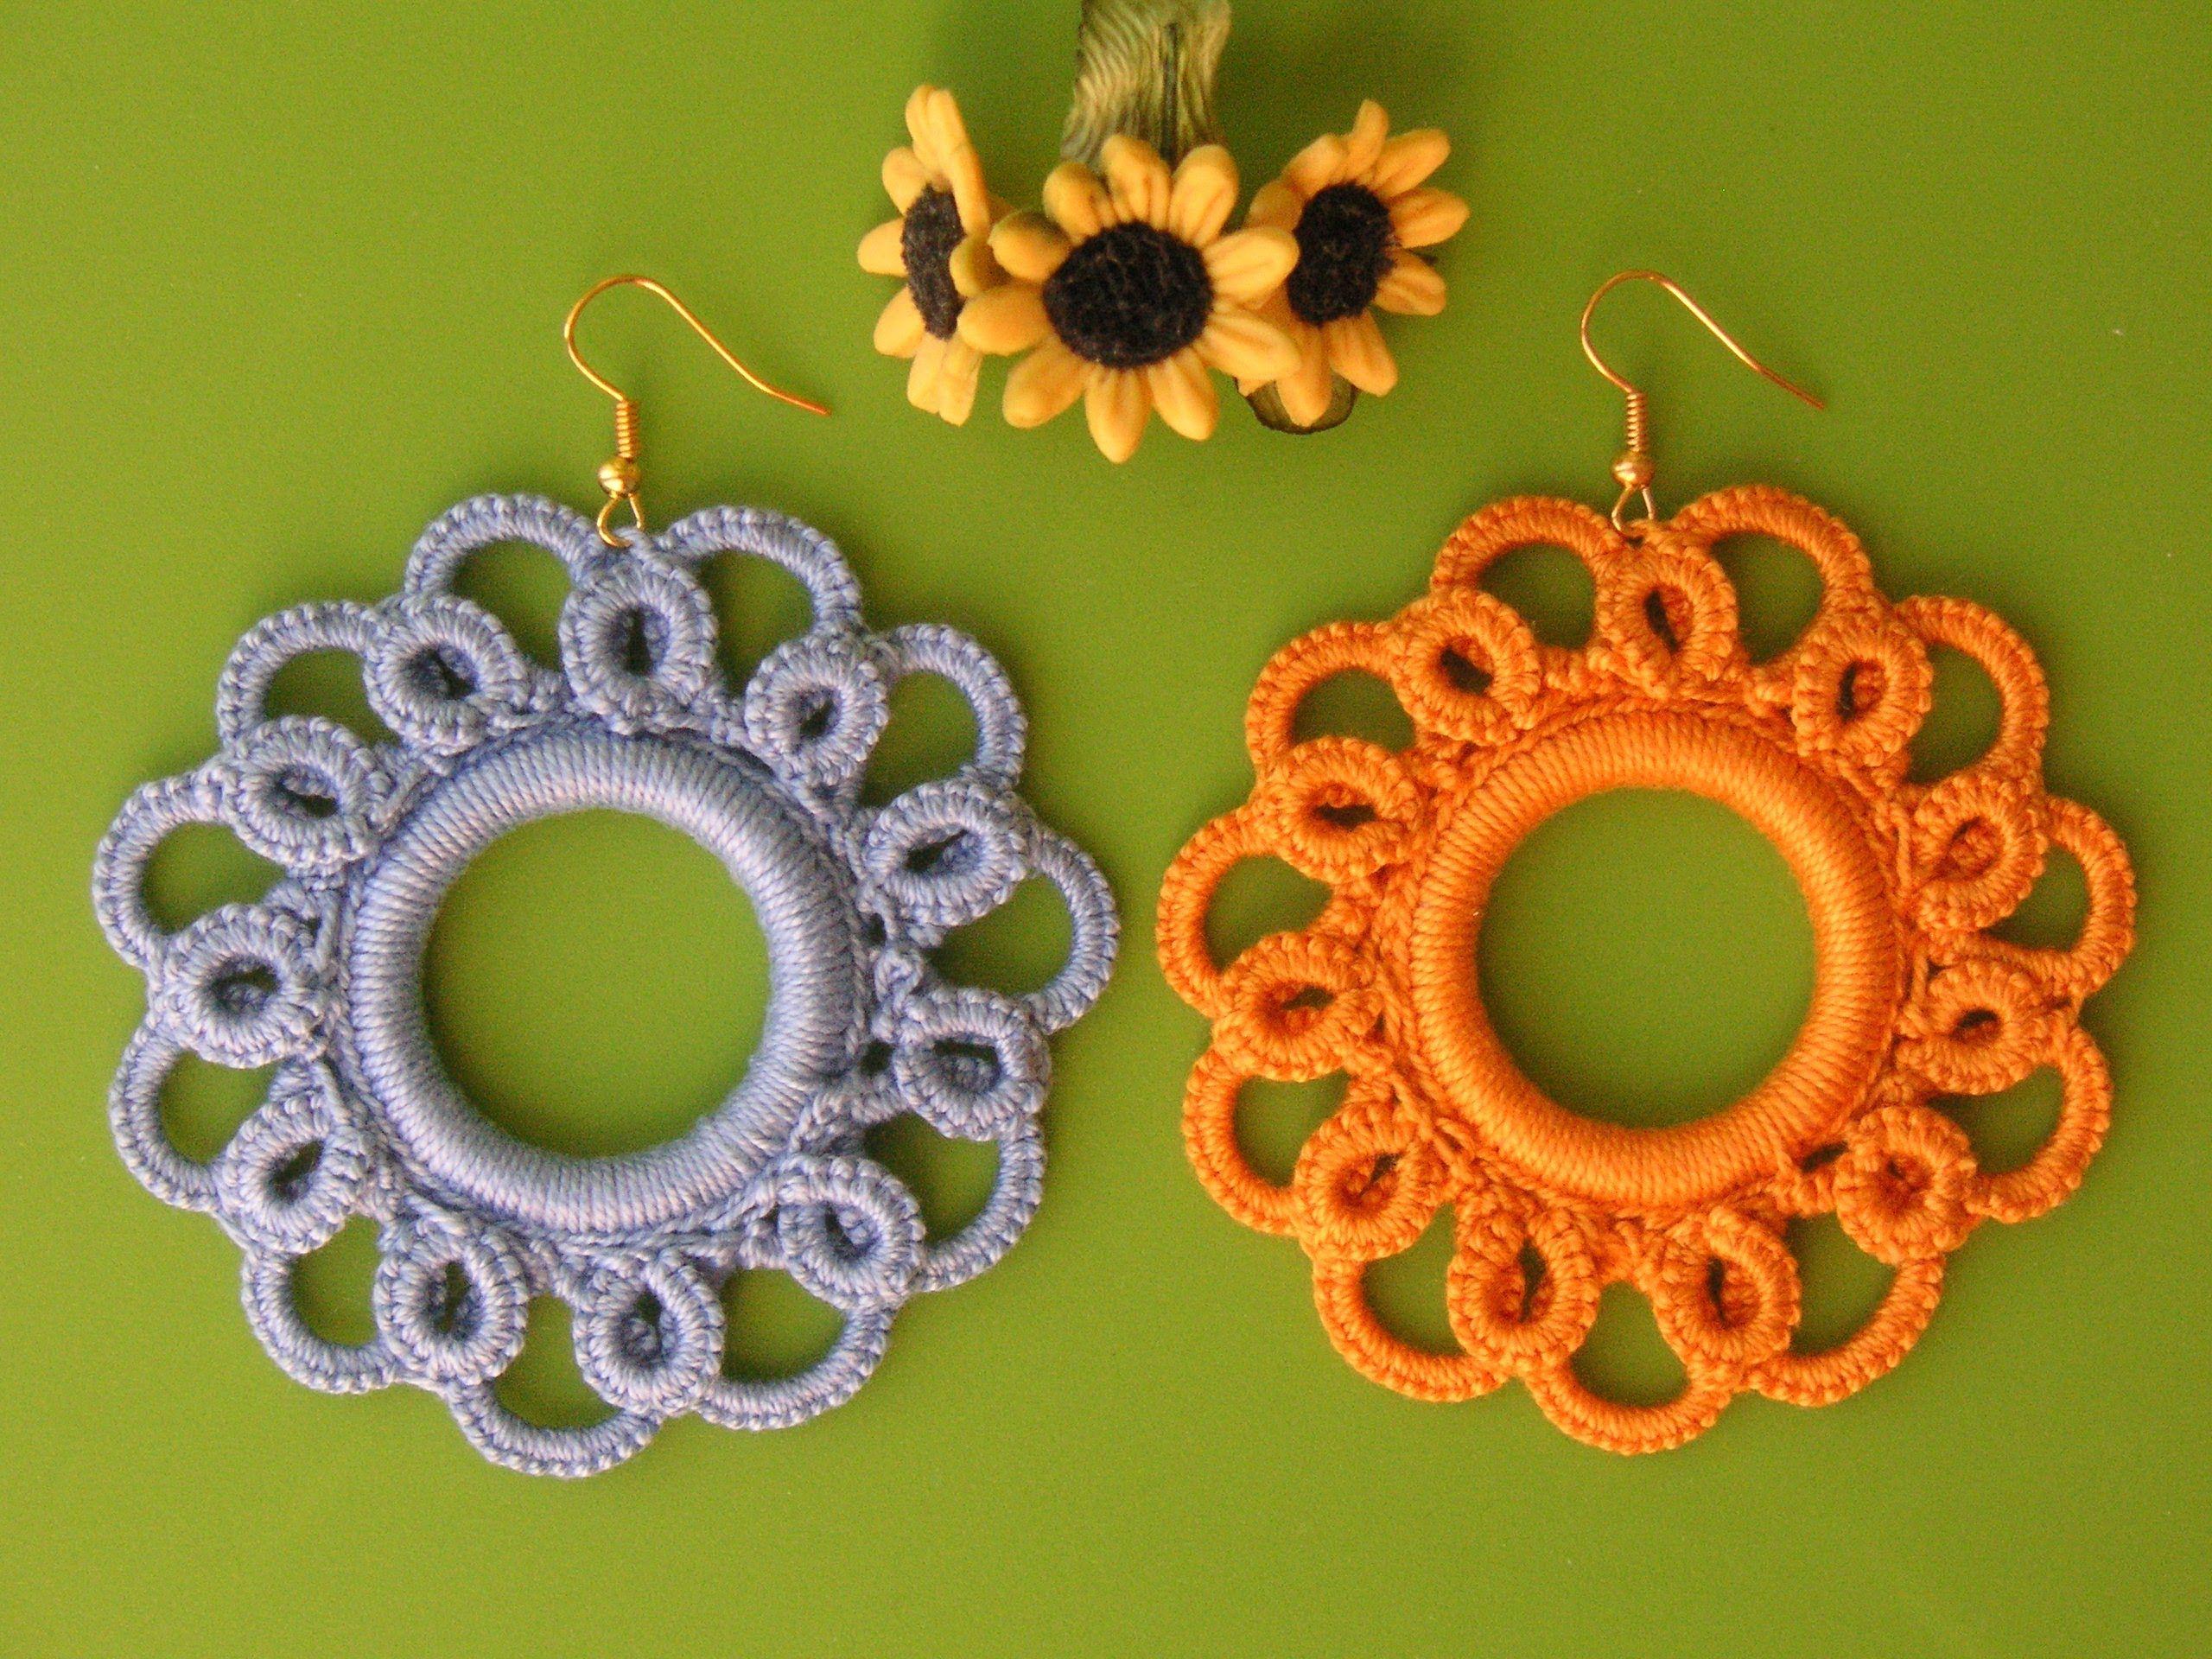 13 Tutorial Orni Uncinetto Chiacchierino Ad Ago Ankars Earrings Needle Tatting Crochet